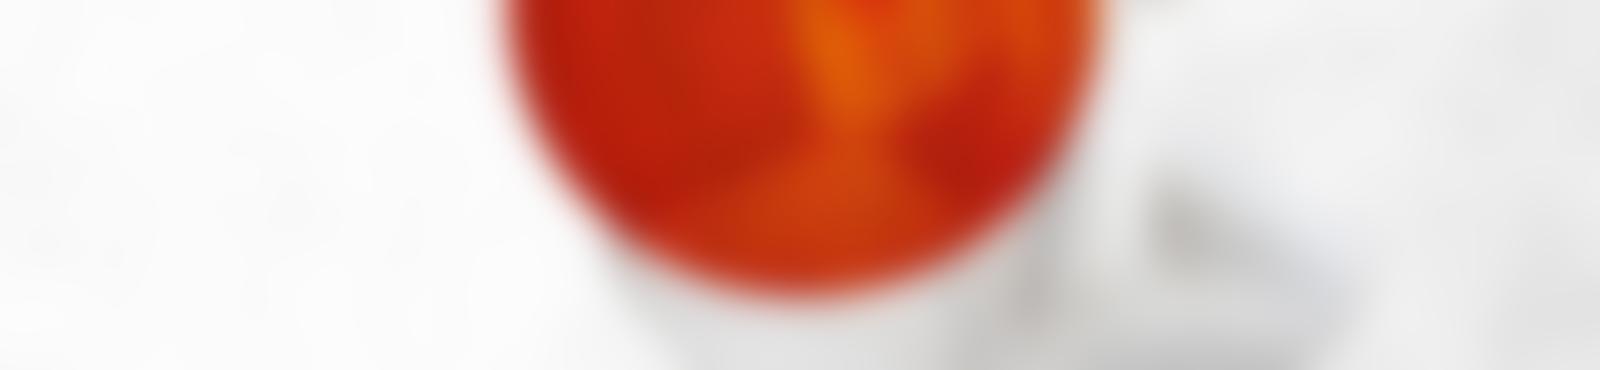 Blurred 3a64640b 8c5f 4e50 bd5f 13a3d5a2be42